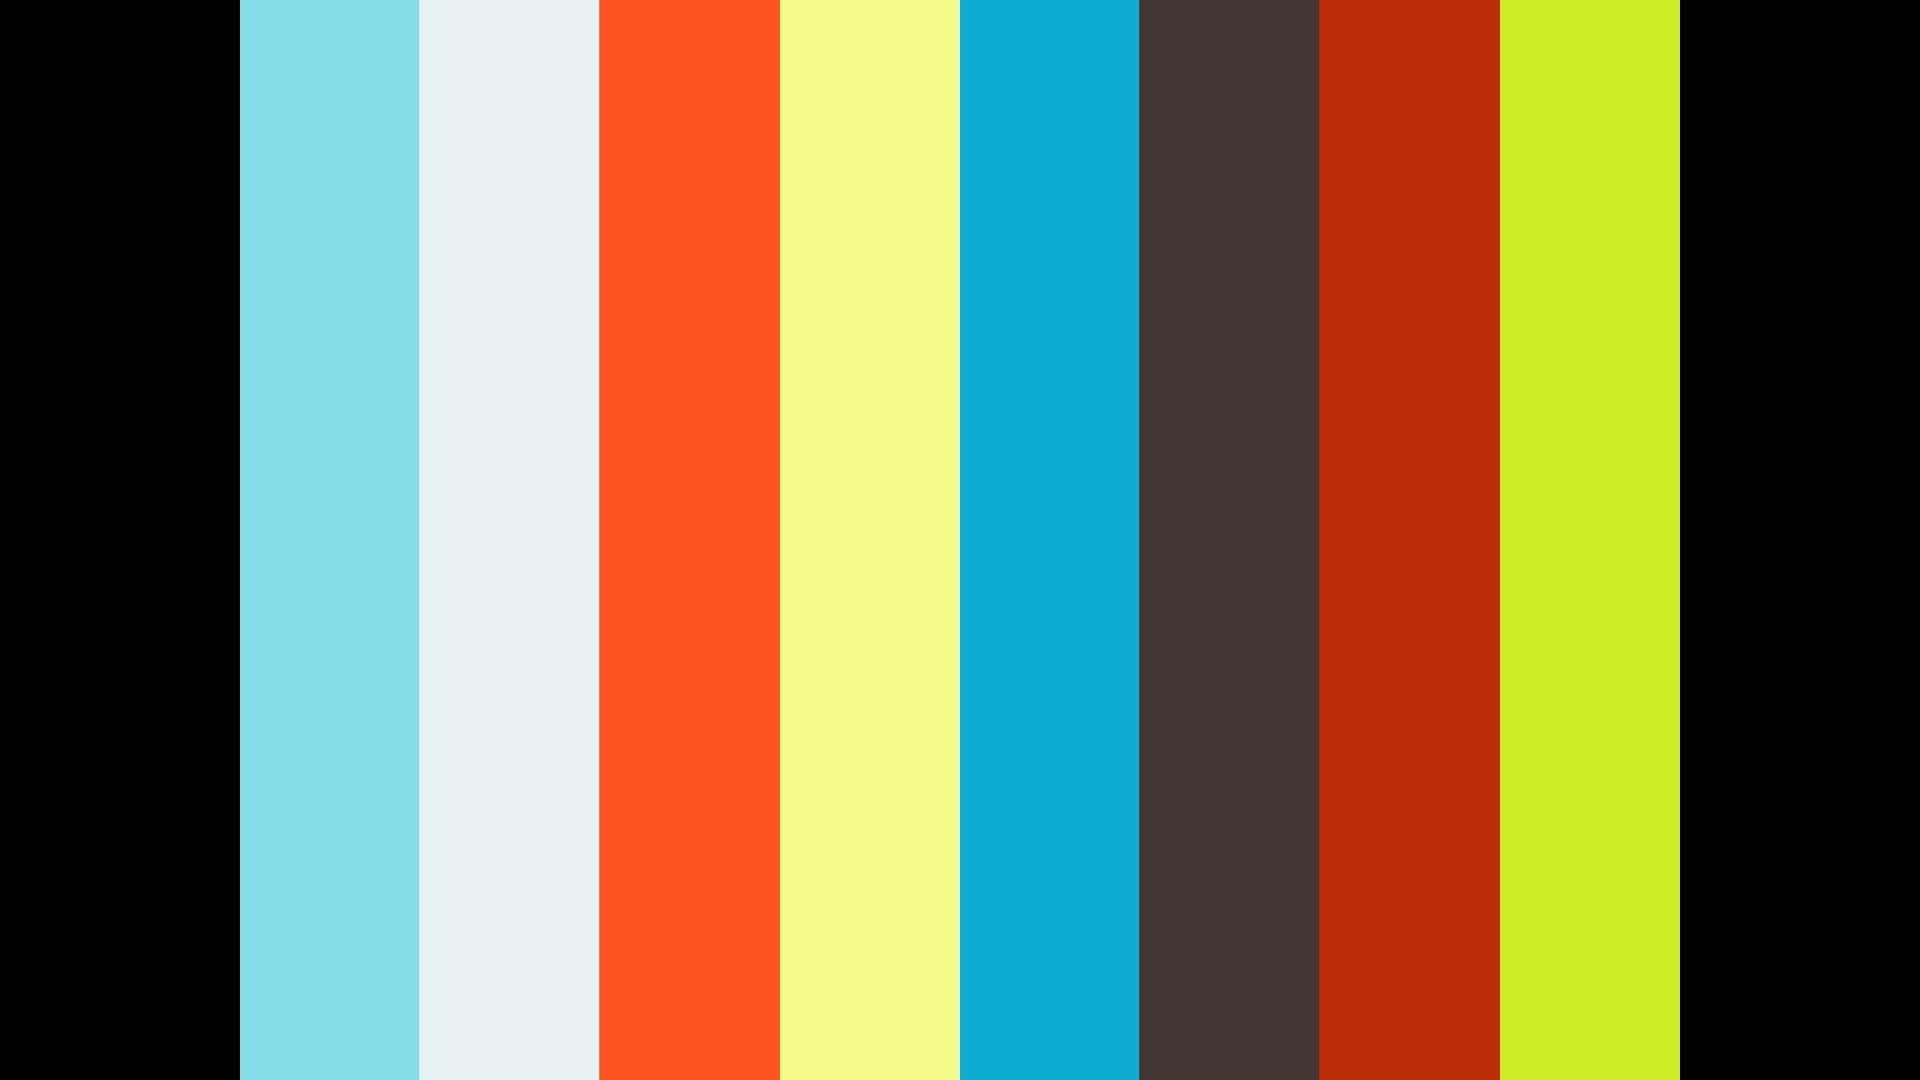 Advanced colour | Affinity Designer for iPad tutorials